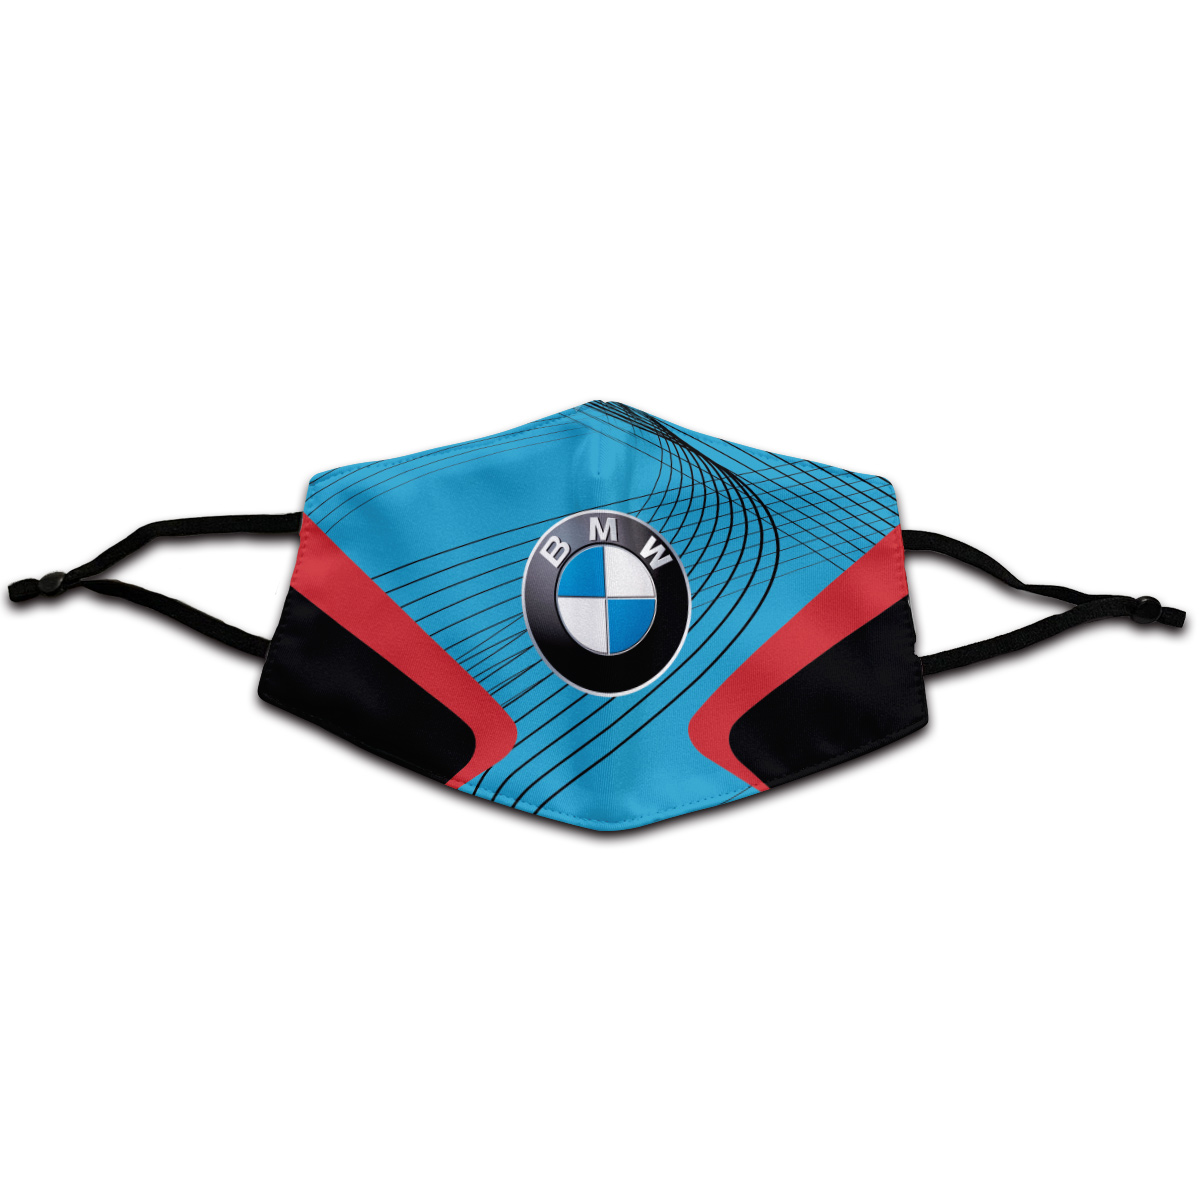 BMW Motorcycle 可重復使用 成人口罩 可水洗防塵男女通用面罩防風